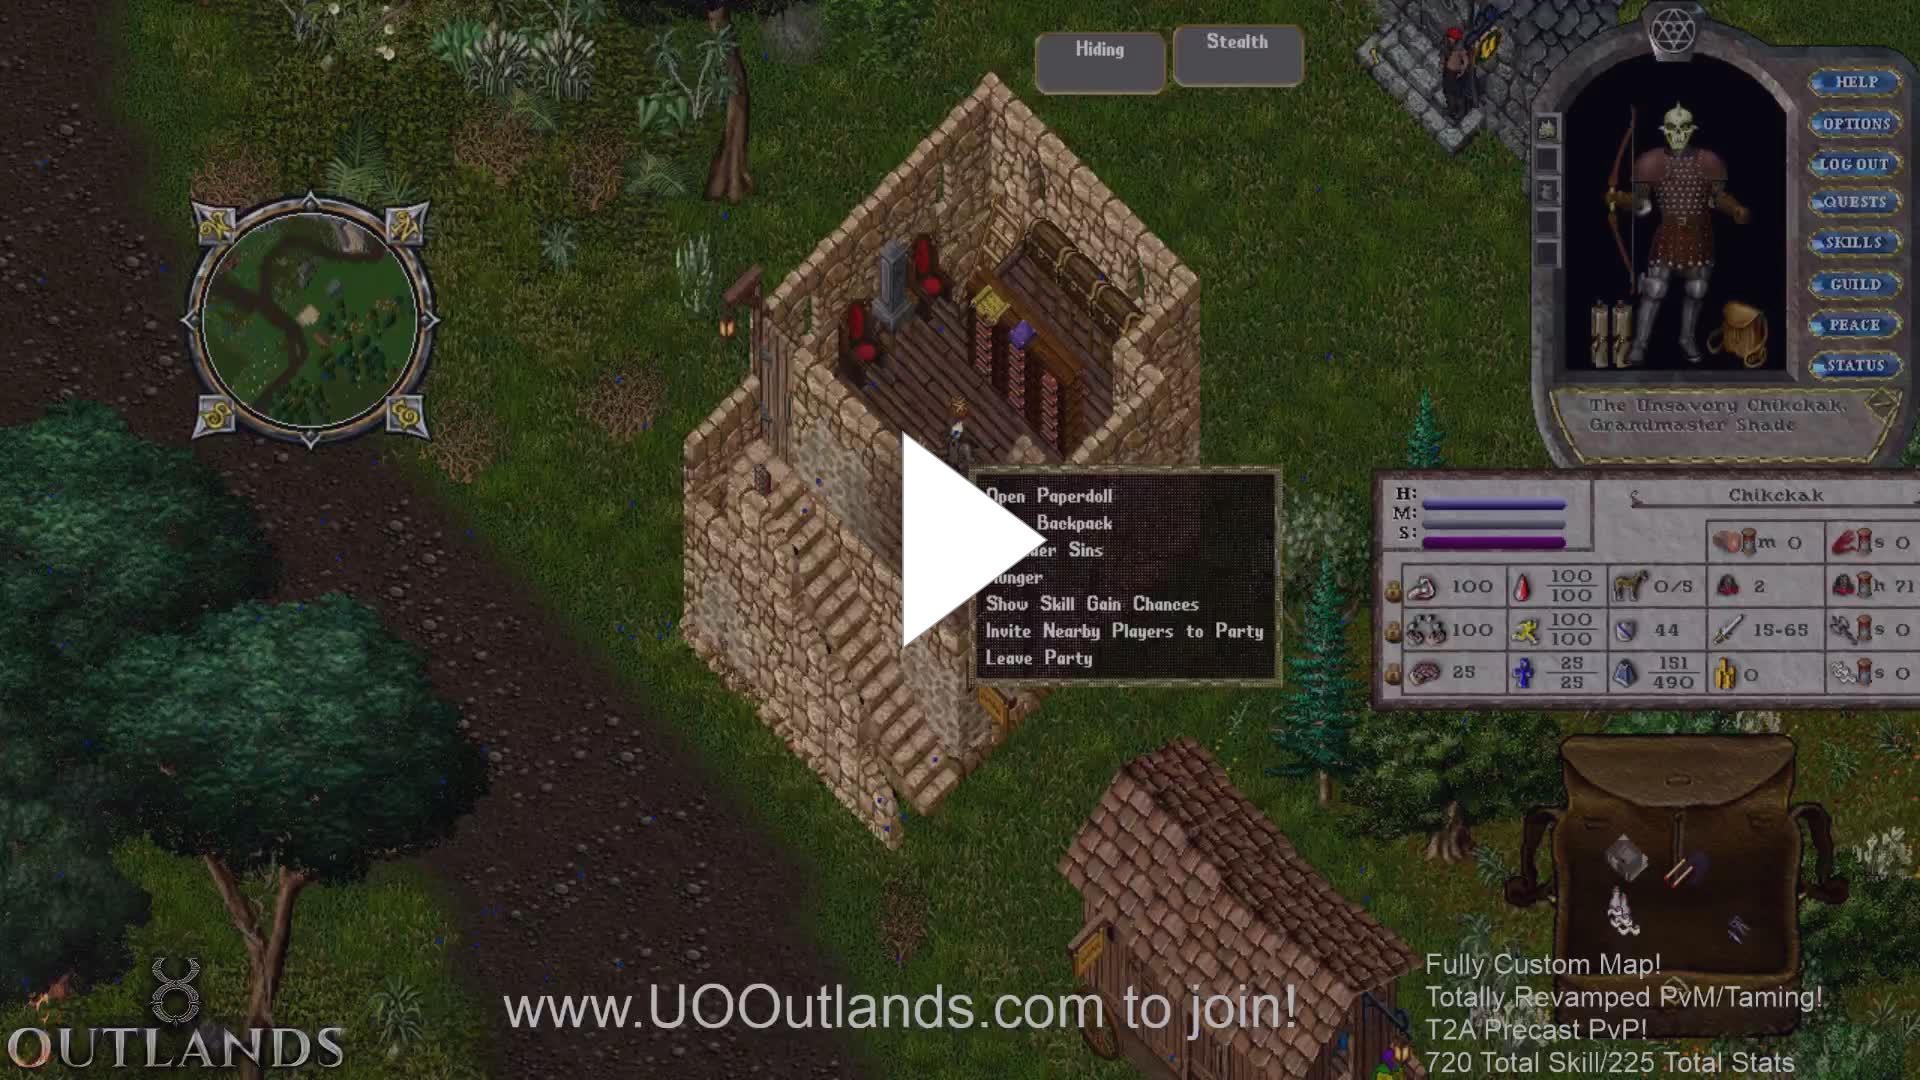 ALLWWW - UO Outlands dungeon runs - Twitch